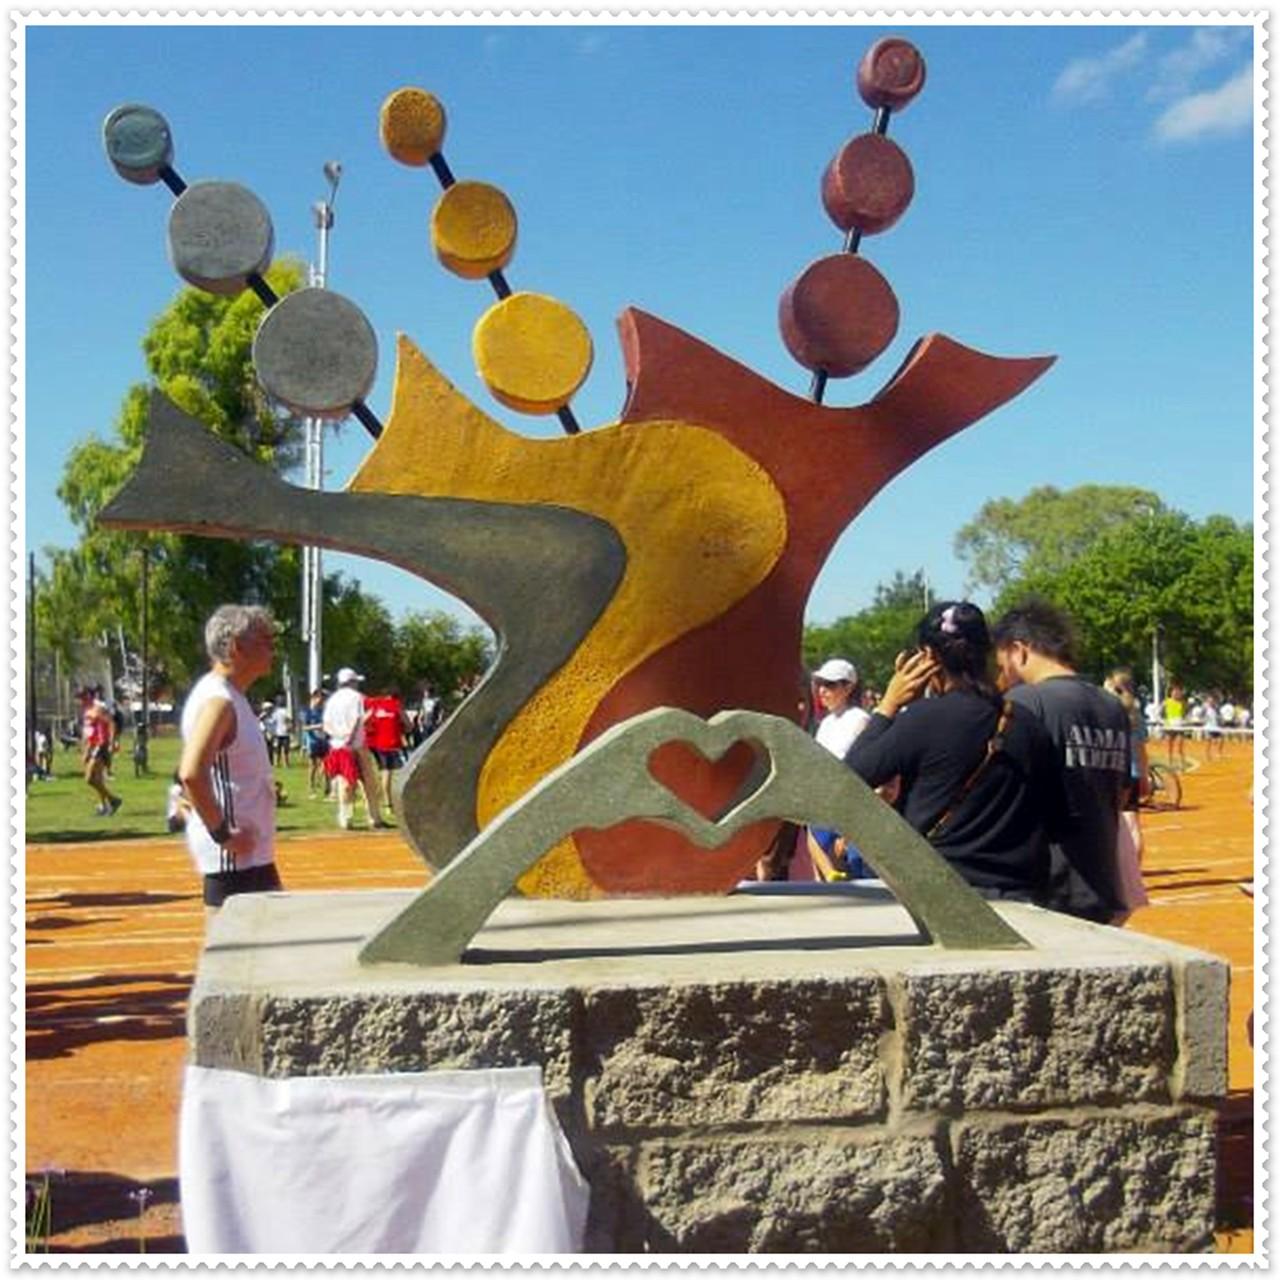 Monumento Homenaje a los Donantes de Médula Osea, Argentina 2014.